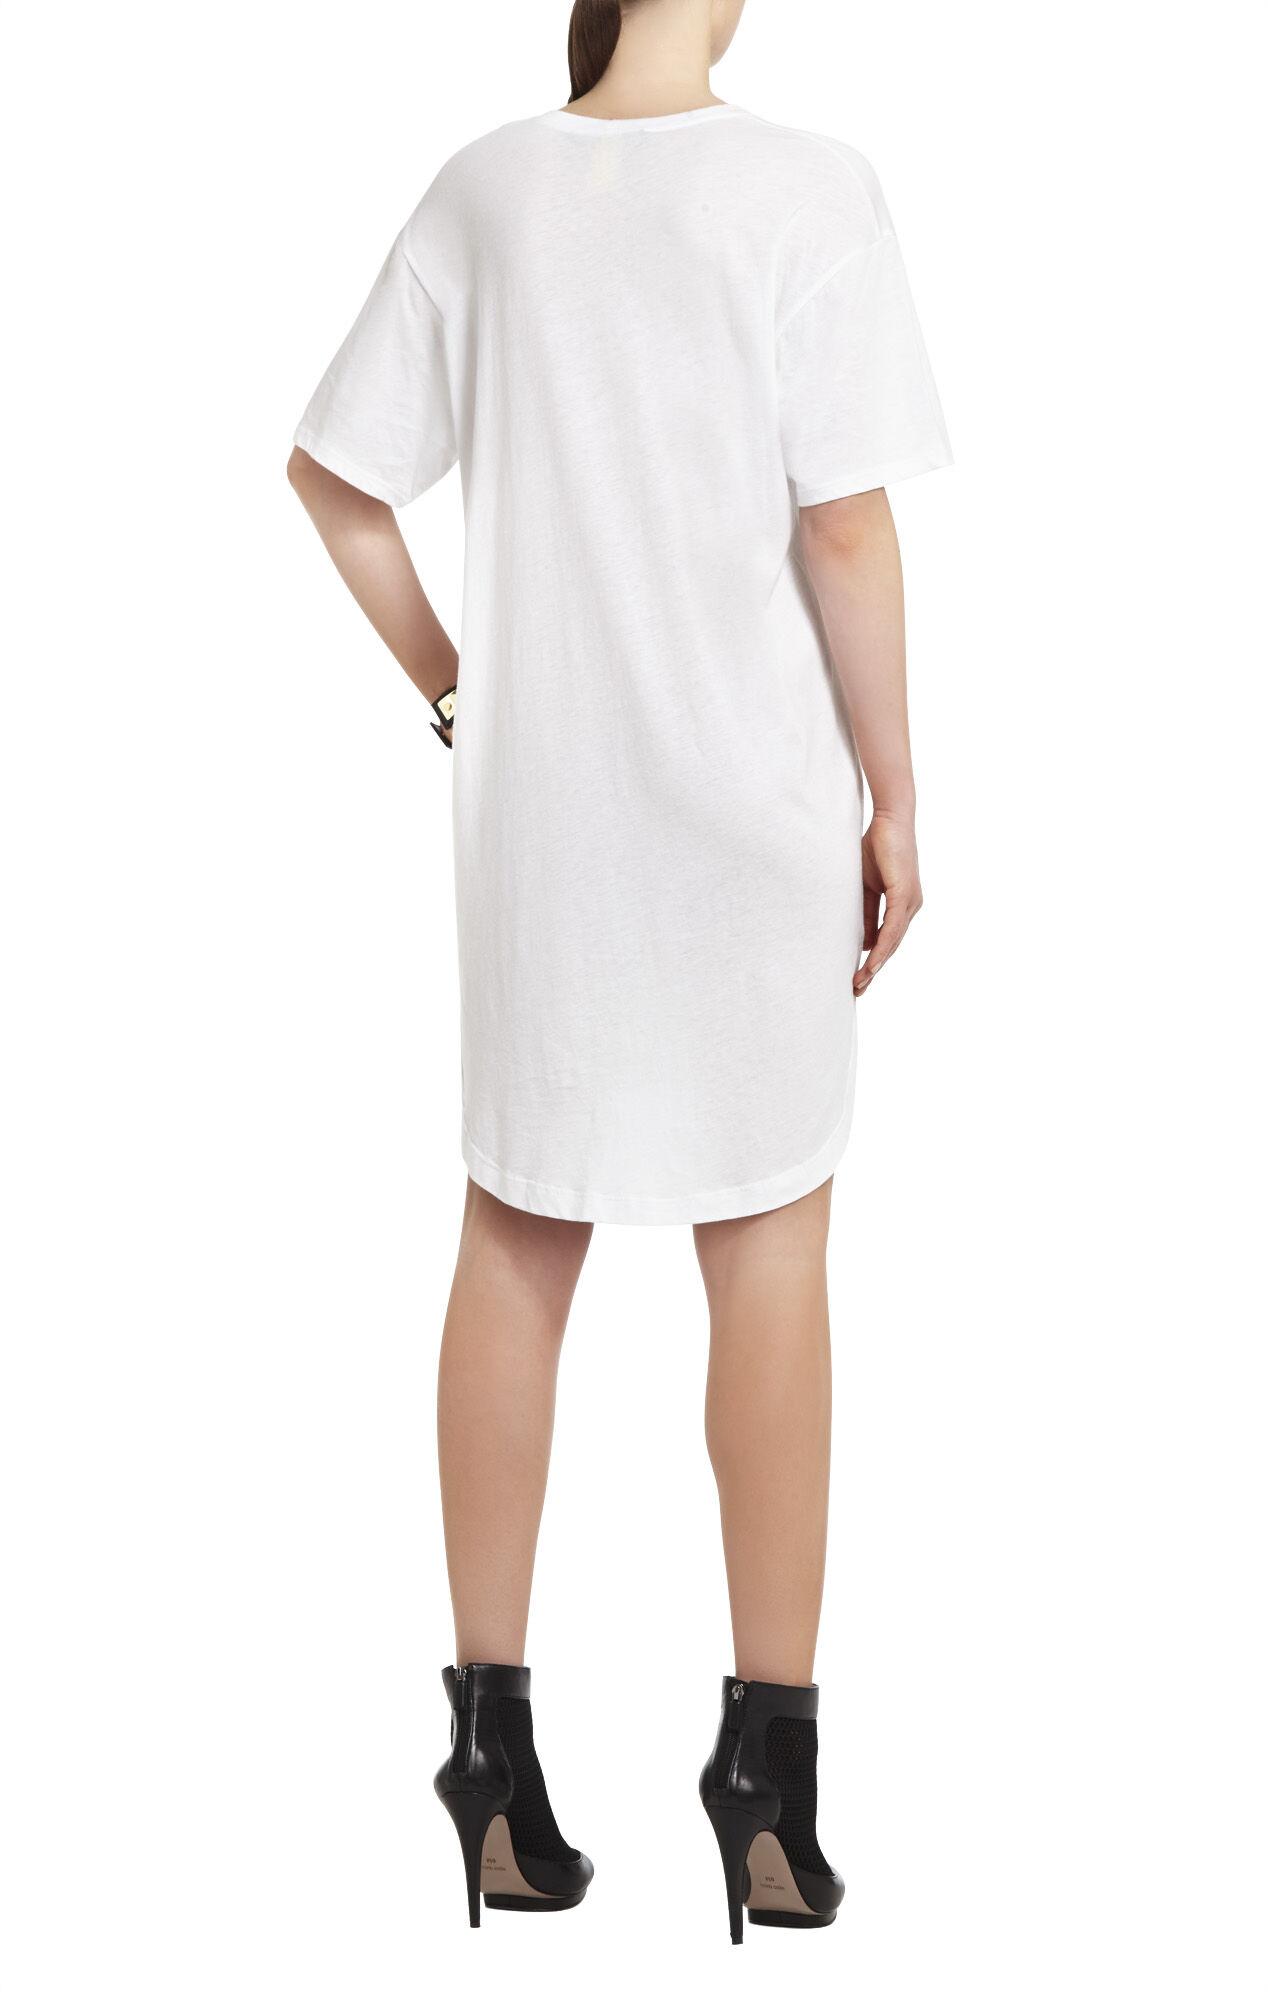 jassa oversized t shirt dress. Black Bedroom Furniture Sets. Home Design Ideas